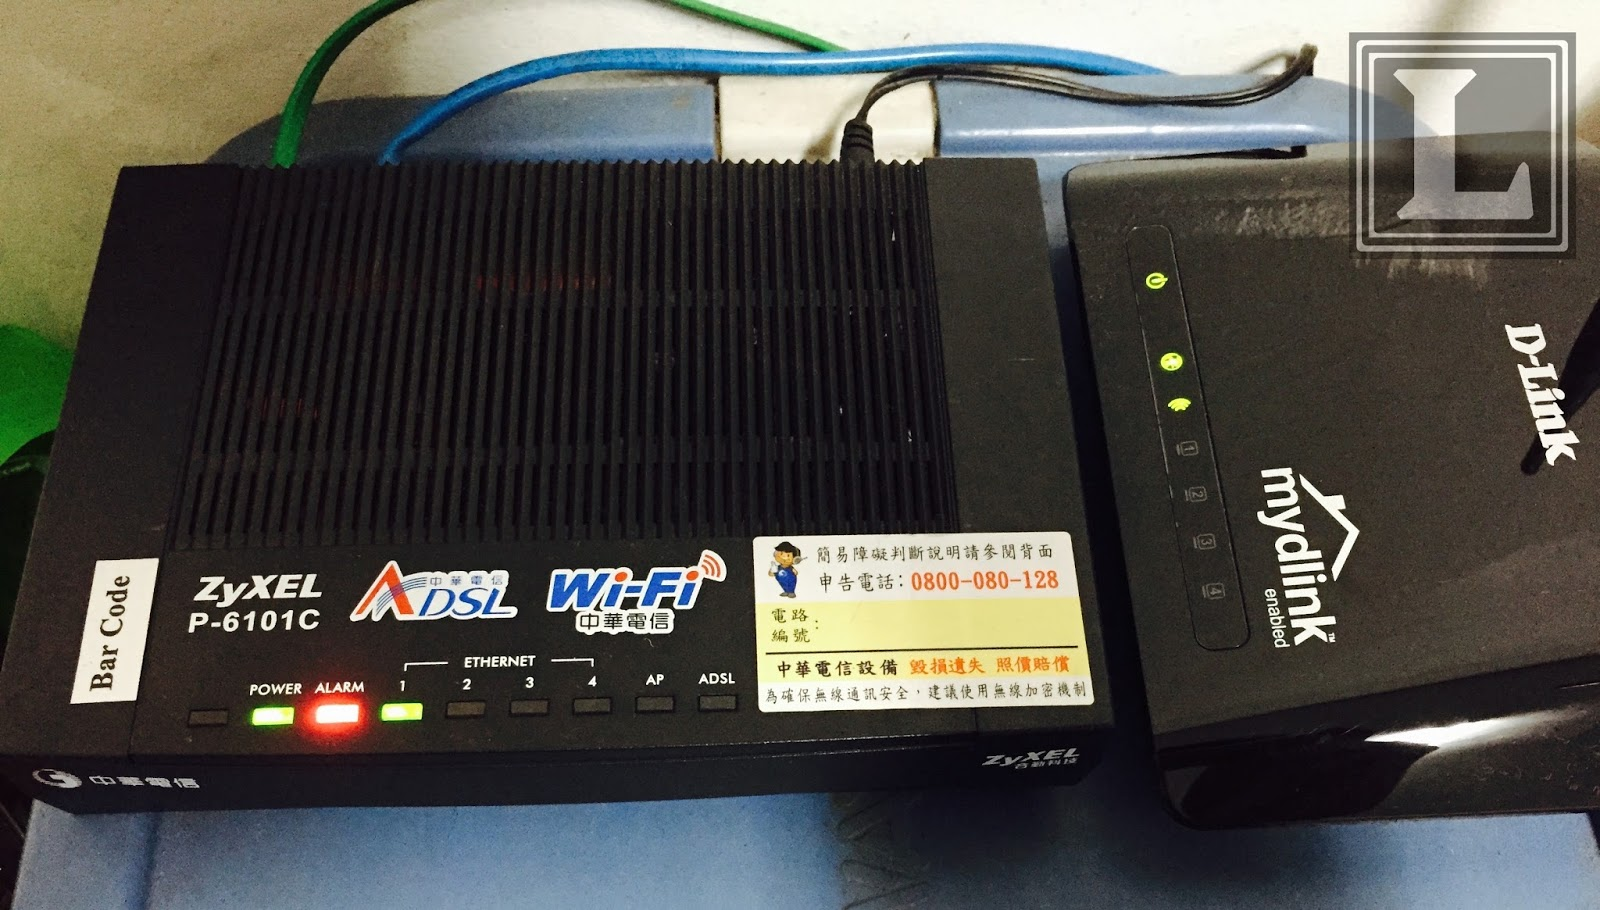 [ HiNet ] [ 經驗分享 ] 中華電信 ADSL 數據機燈號閃爍 報修經驗分享 | Laird Studio